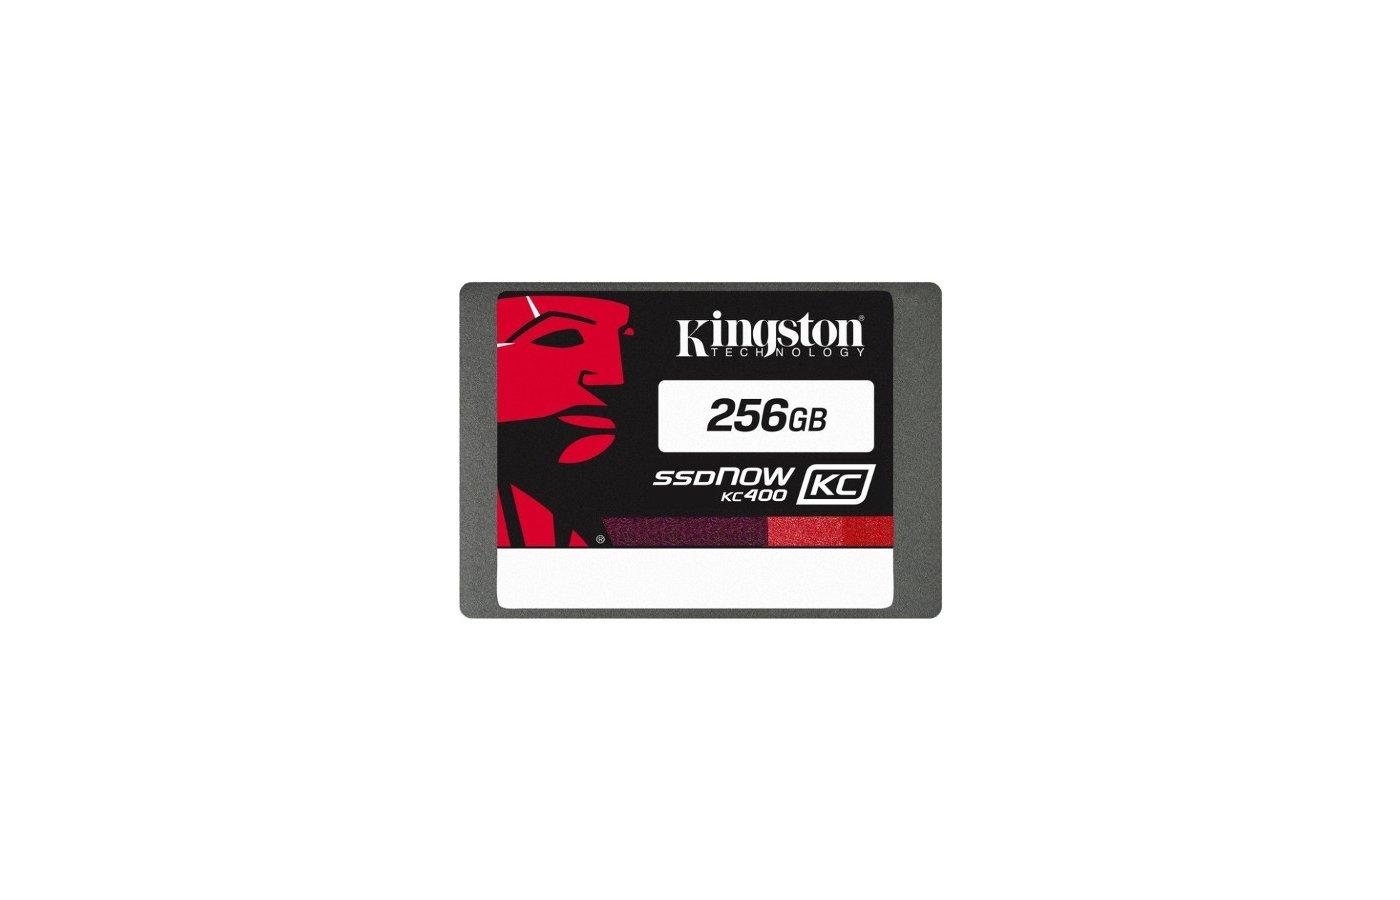 SSD жесткий диск Kingston 256GB SSDNow SKC400S3B7A/256G SSD SATA 3 2.5 (7mm) Upgrade Bundle Kit